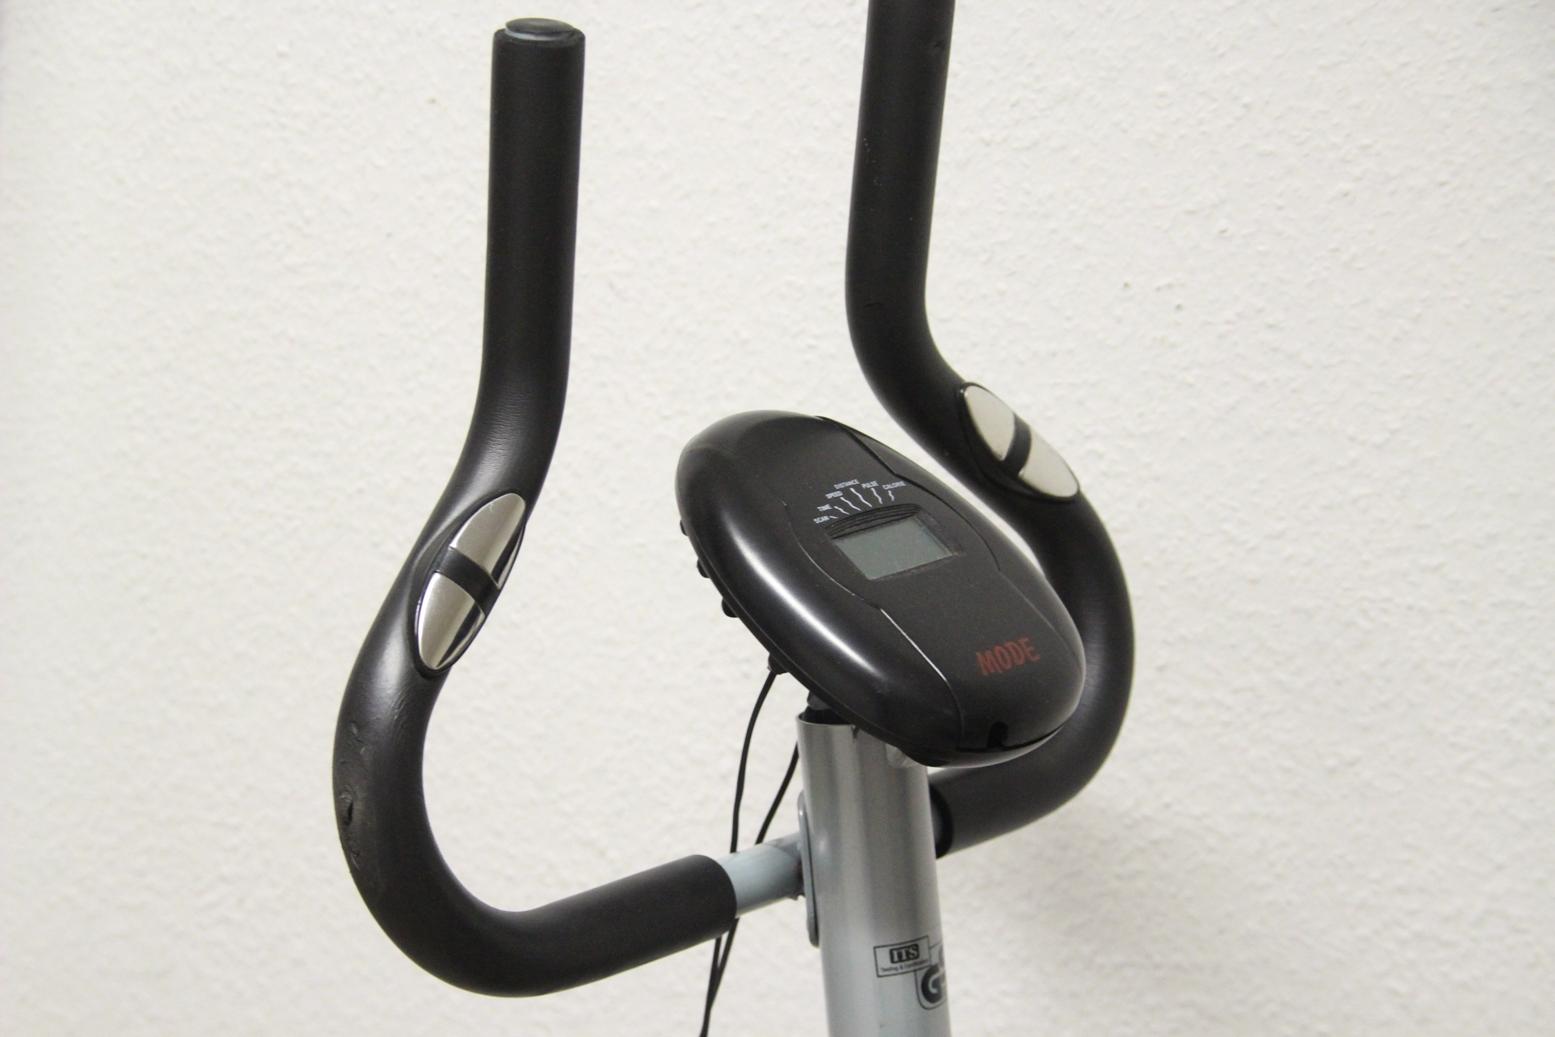 mode magnetic light heimtrainer ergometer fahrradtrainer hometrainer fitnessbike ebay. Black Bedroom Furniture Sets. Home Design Ideas